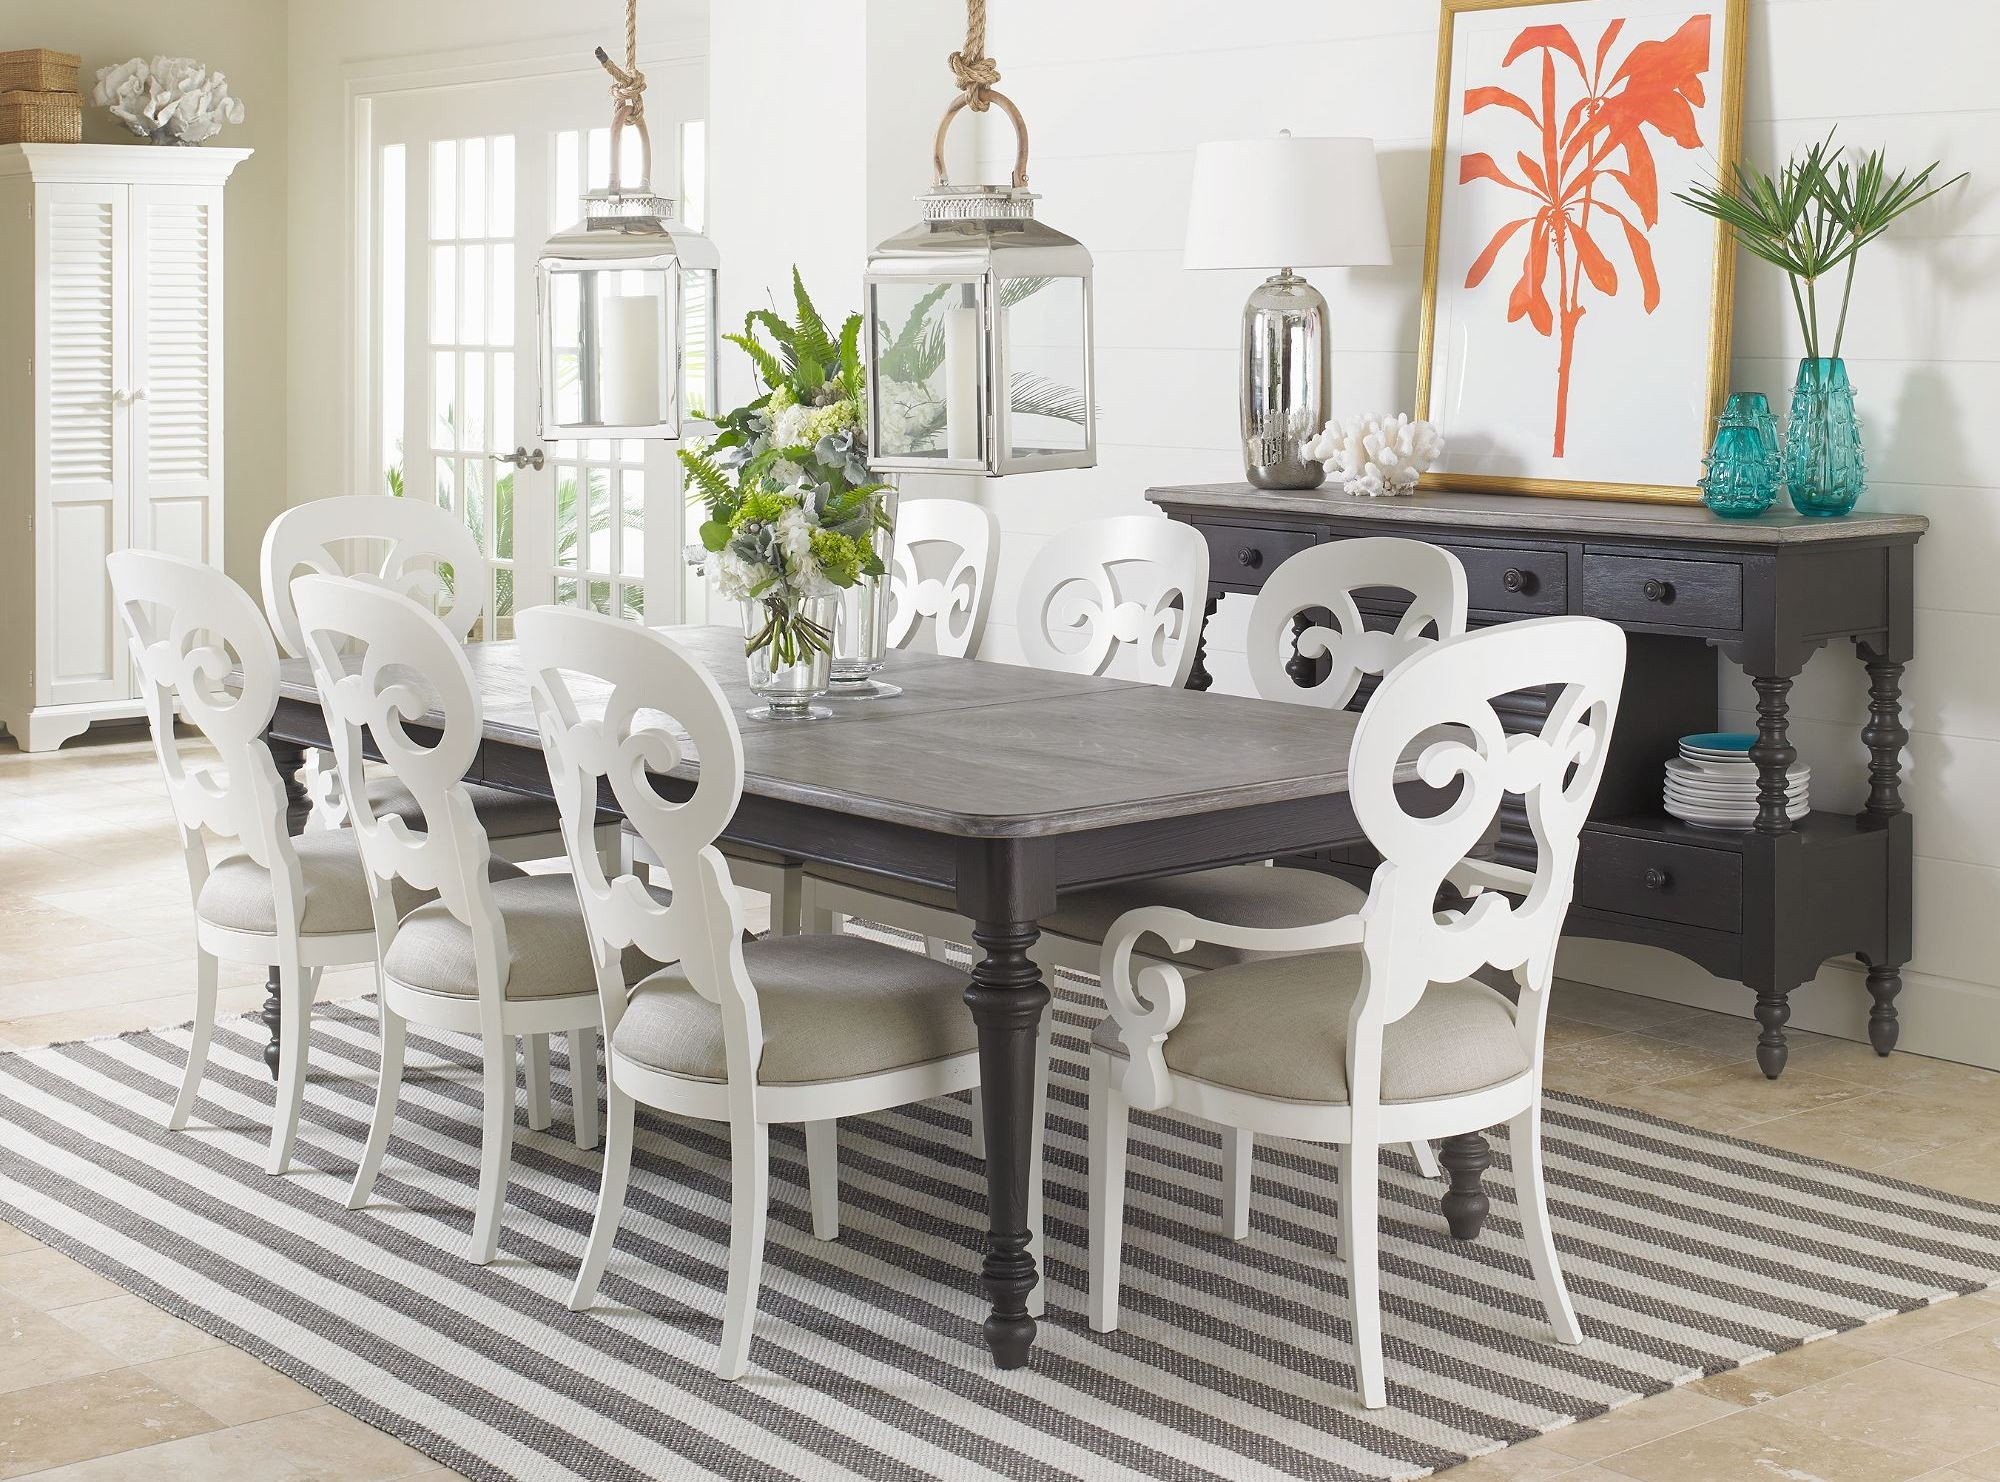 Coastal Living Dining Table: Coastal Living Saltbox White Rectangular Leg Dining Table